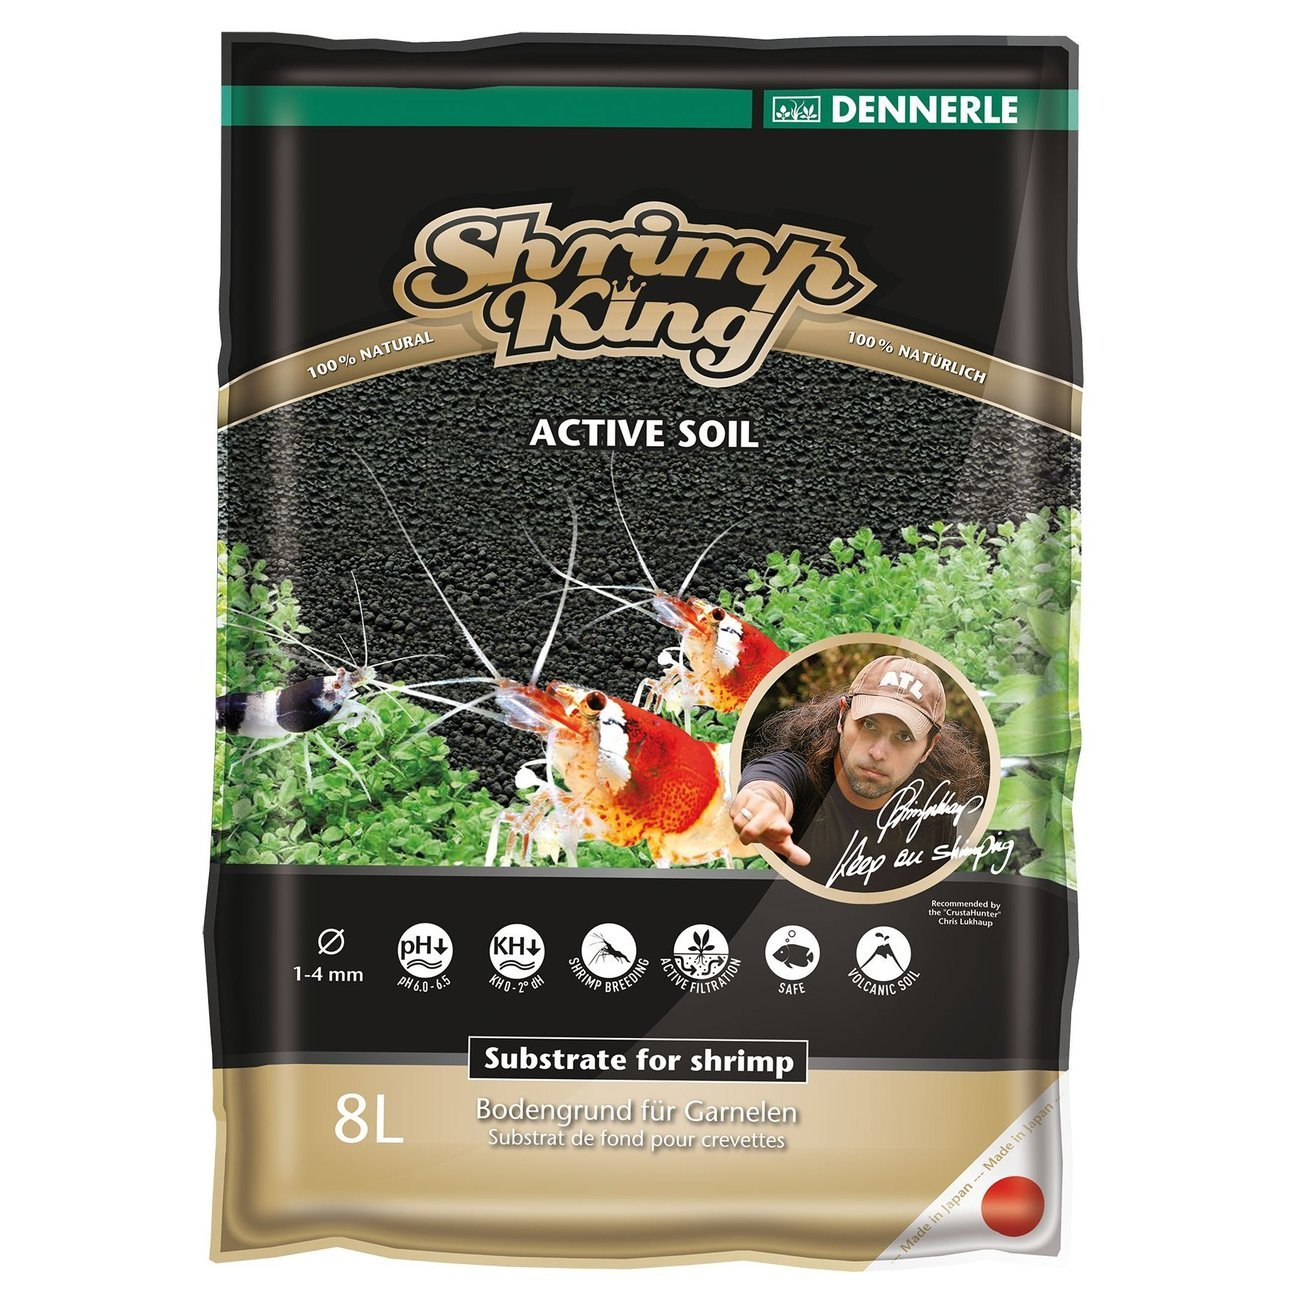 Dennerle Shrimp King Active Soil